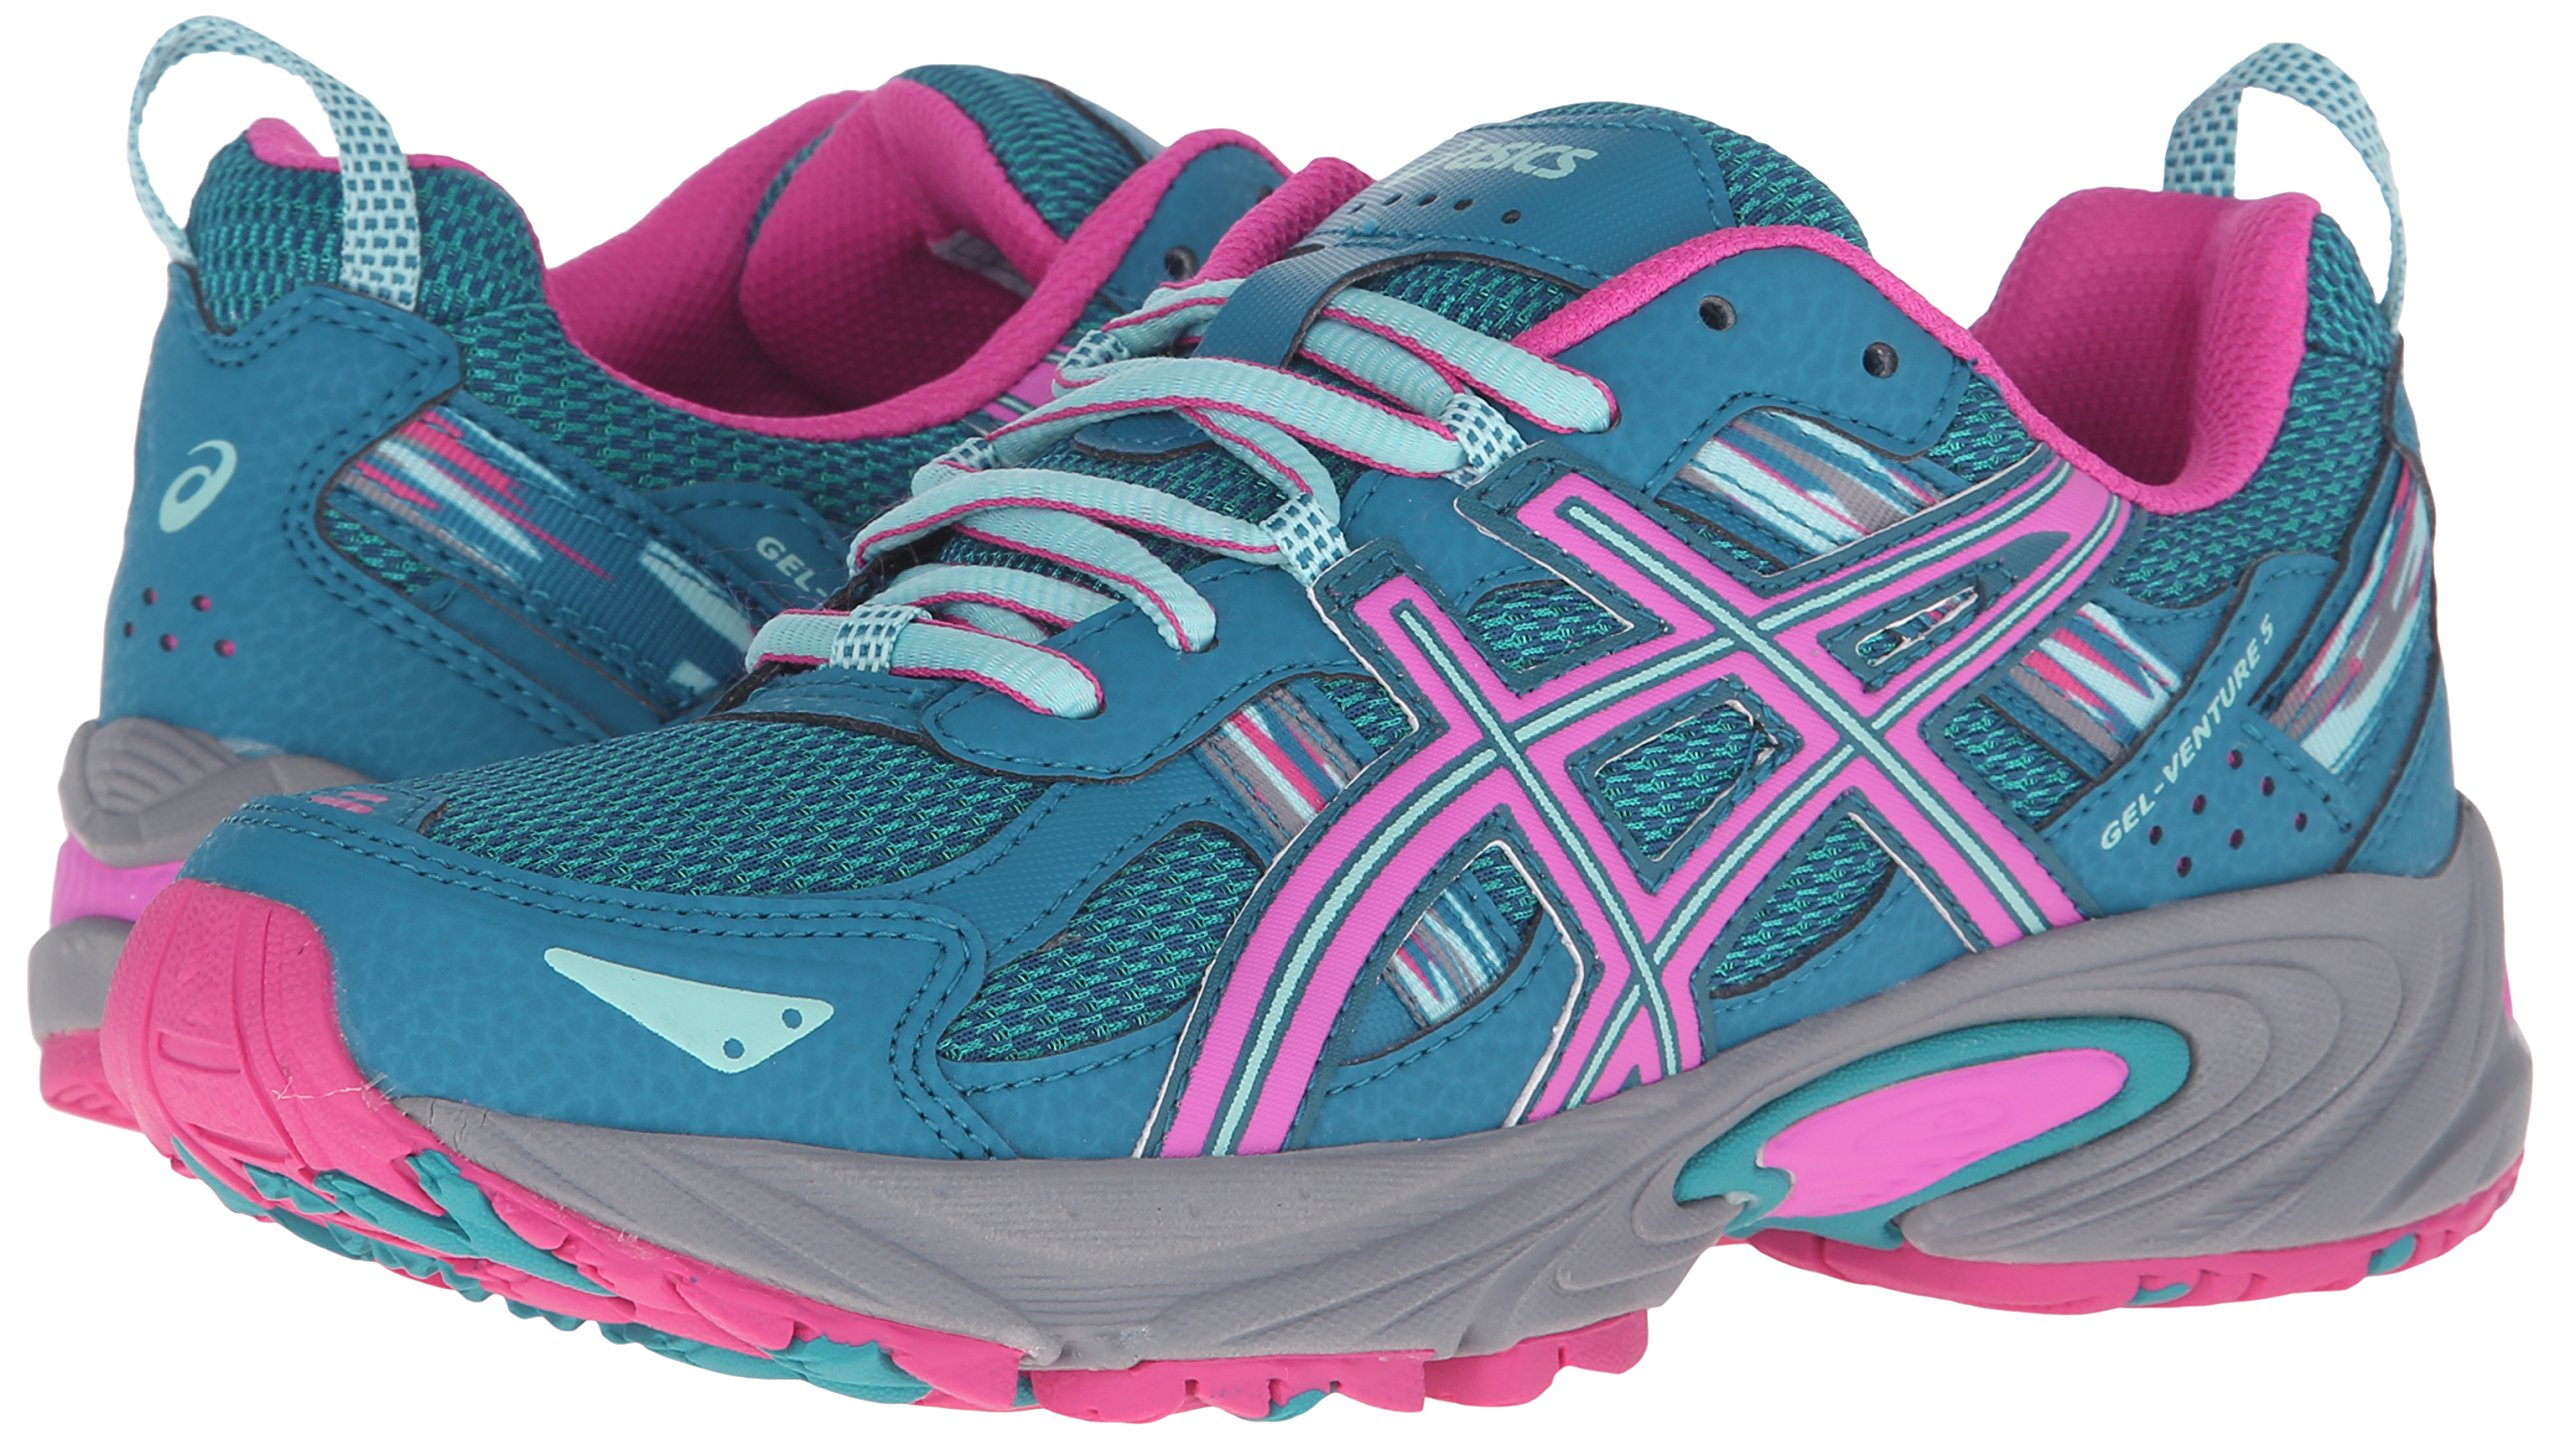 ASICS Women's Gel-Venture 5 Trail Runner Ocean Depth/Pink Glow/Aruba Blue 6 M US by ASICS (Image #6)